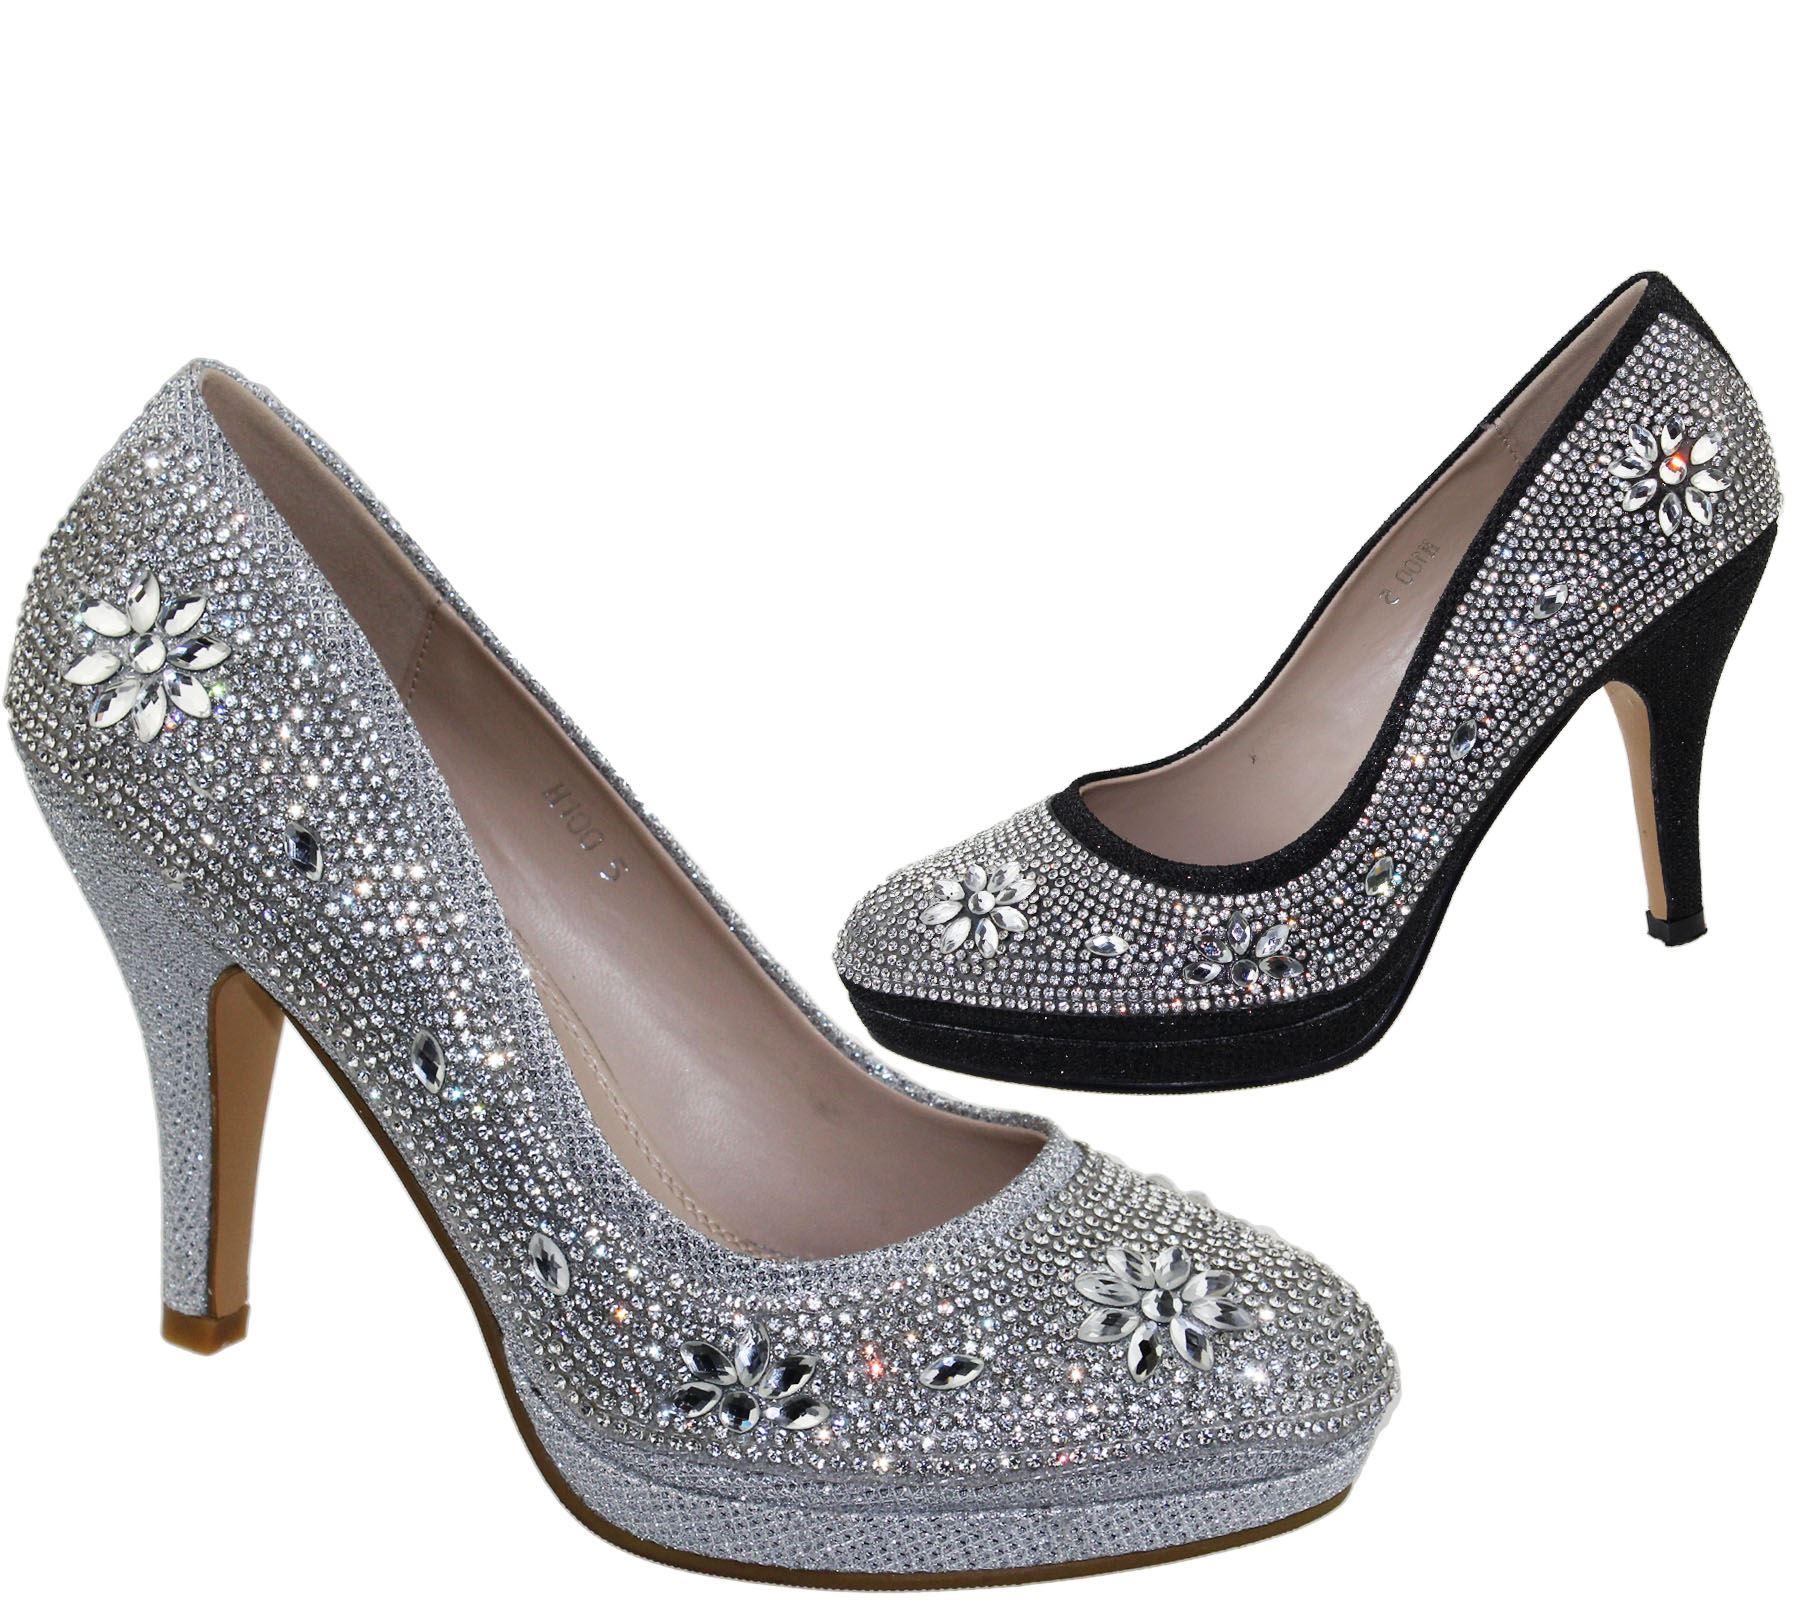 Womens-Platforms-High-Heels-Wedding-Bridal-Evening-Diamante-Ladies-Party-Shoes miniatura 16